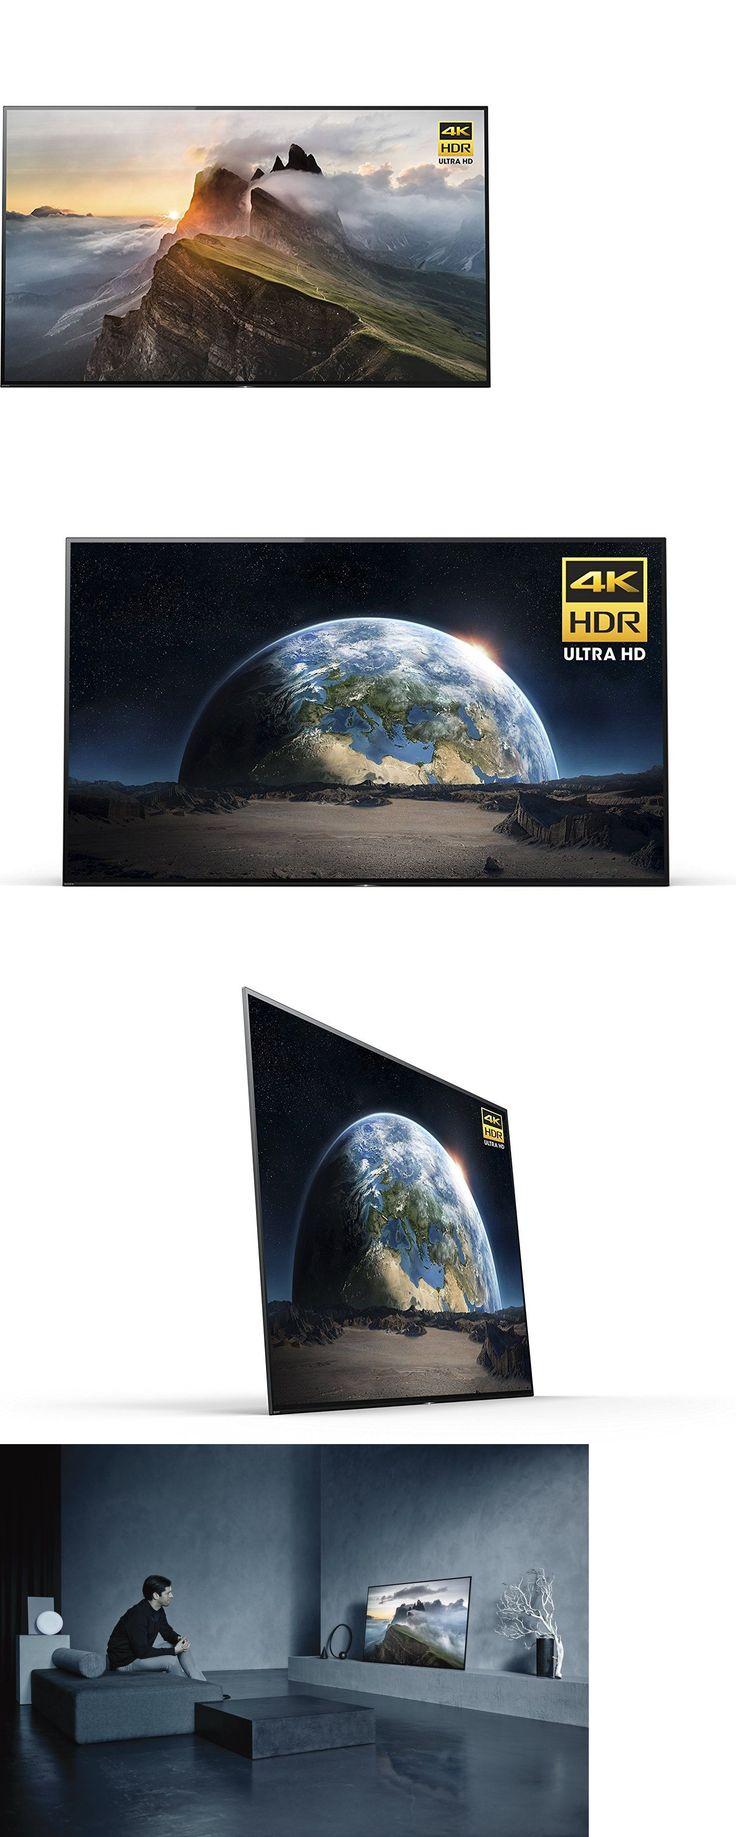 electronics: Sony Xbr55a1e 55-Inch 4K Ultra Hd Smart Bravia Oled Tv (2017 Model) Hdmi Bundle -> BUY IT NOW ONLY: $3099.52 on eBay!